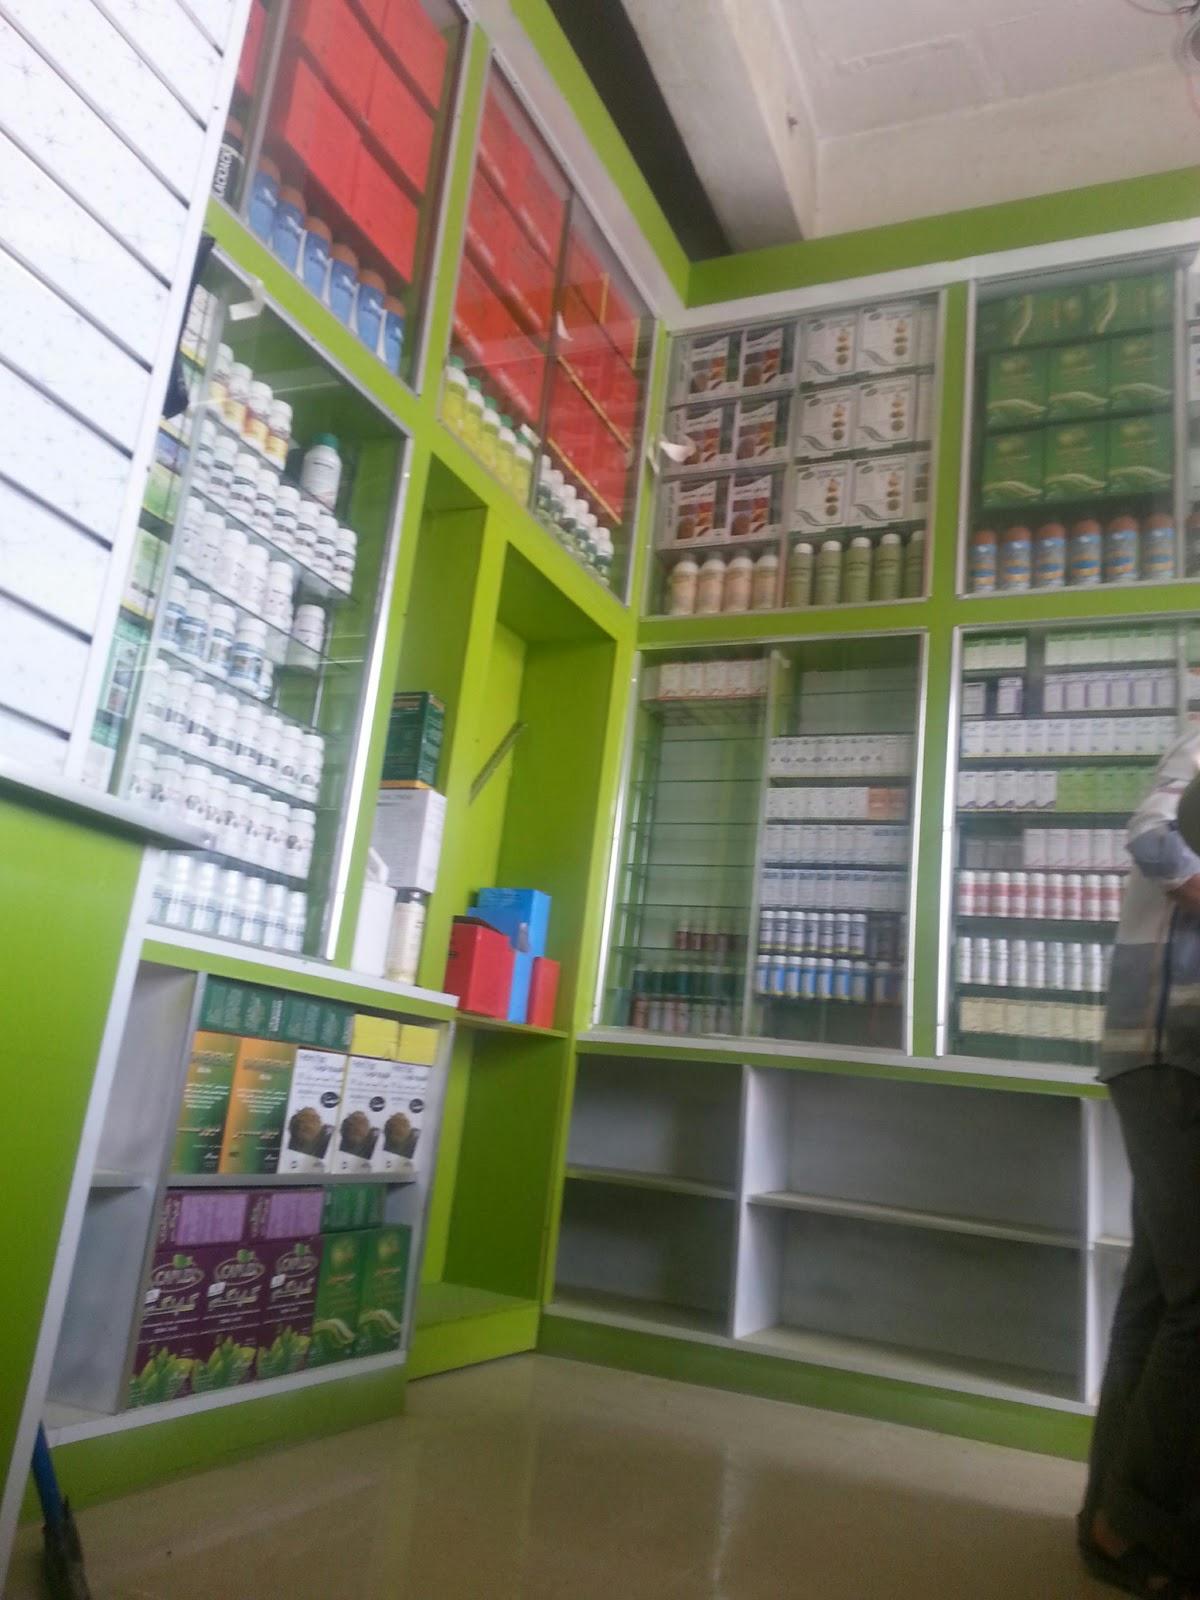 a0ae9e42d ديكورمان: ديكور محلات بيع الا سمدة ولمبيدات الحشرية